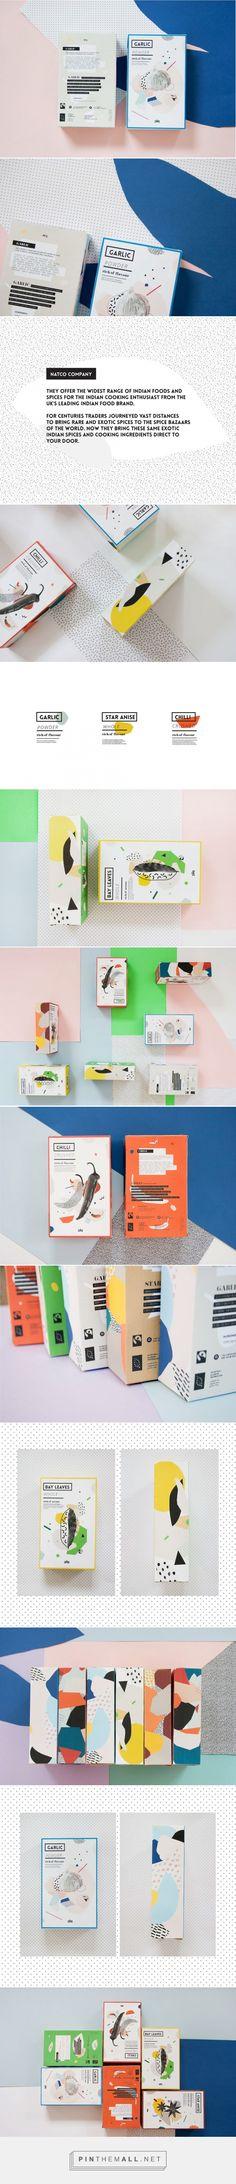 Packaging for Spices Concept Design by Agata Jeziurska (Poland) - http://www.packagingoftheworld.com/2016/05/packaging-for-spices-concept.html